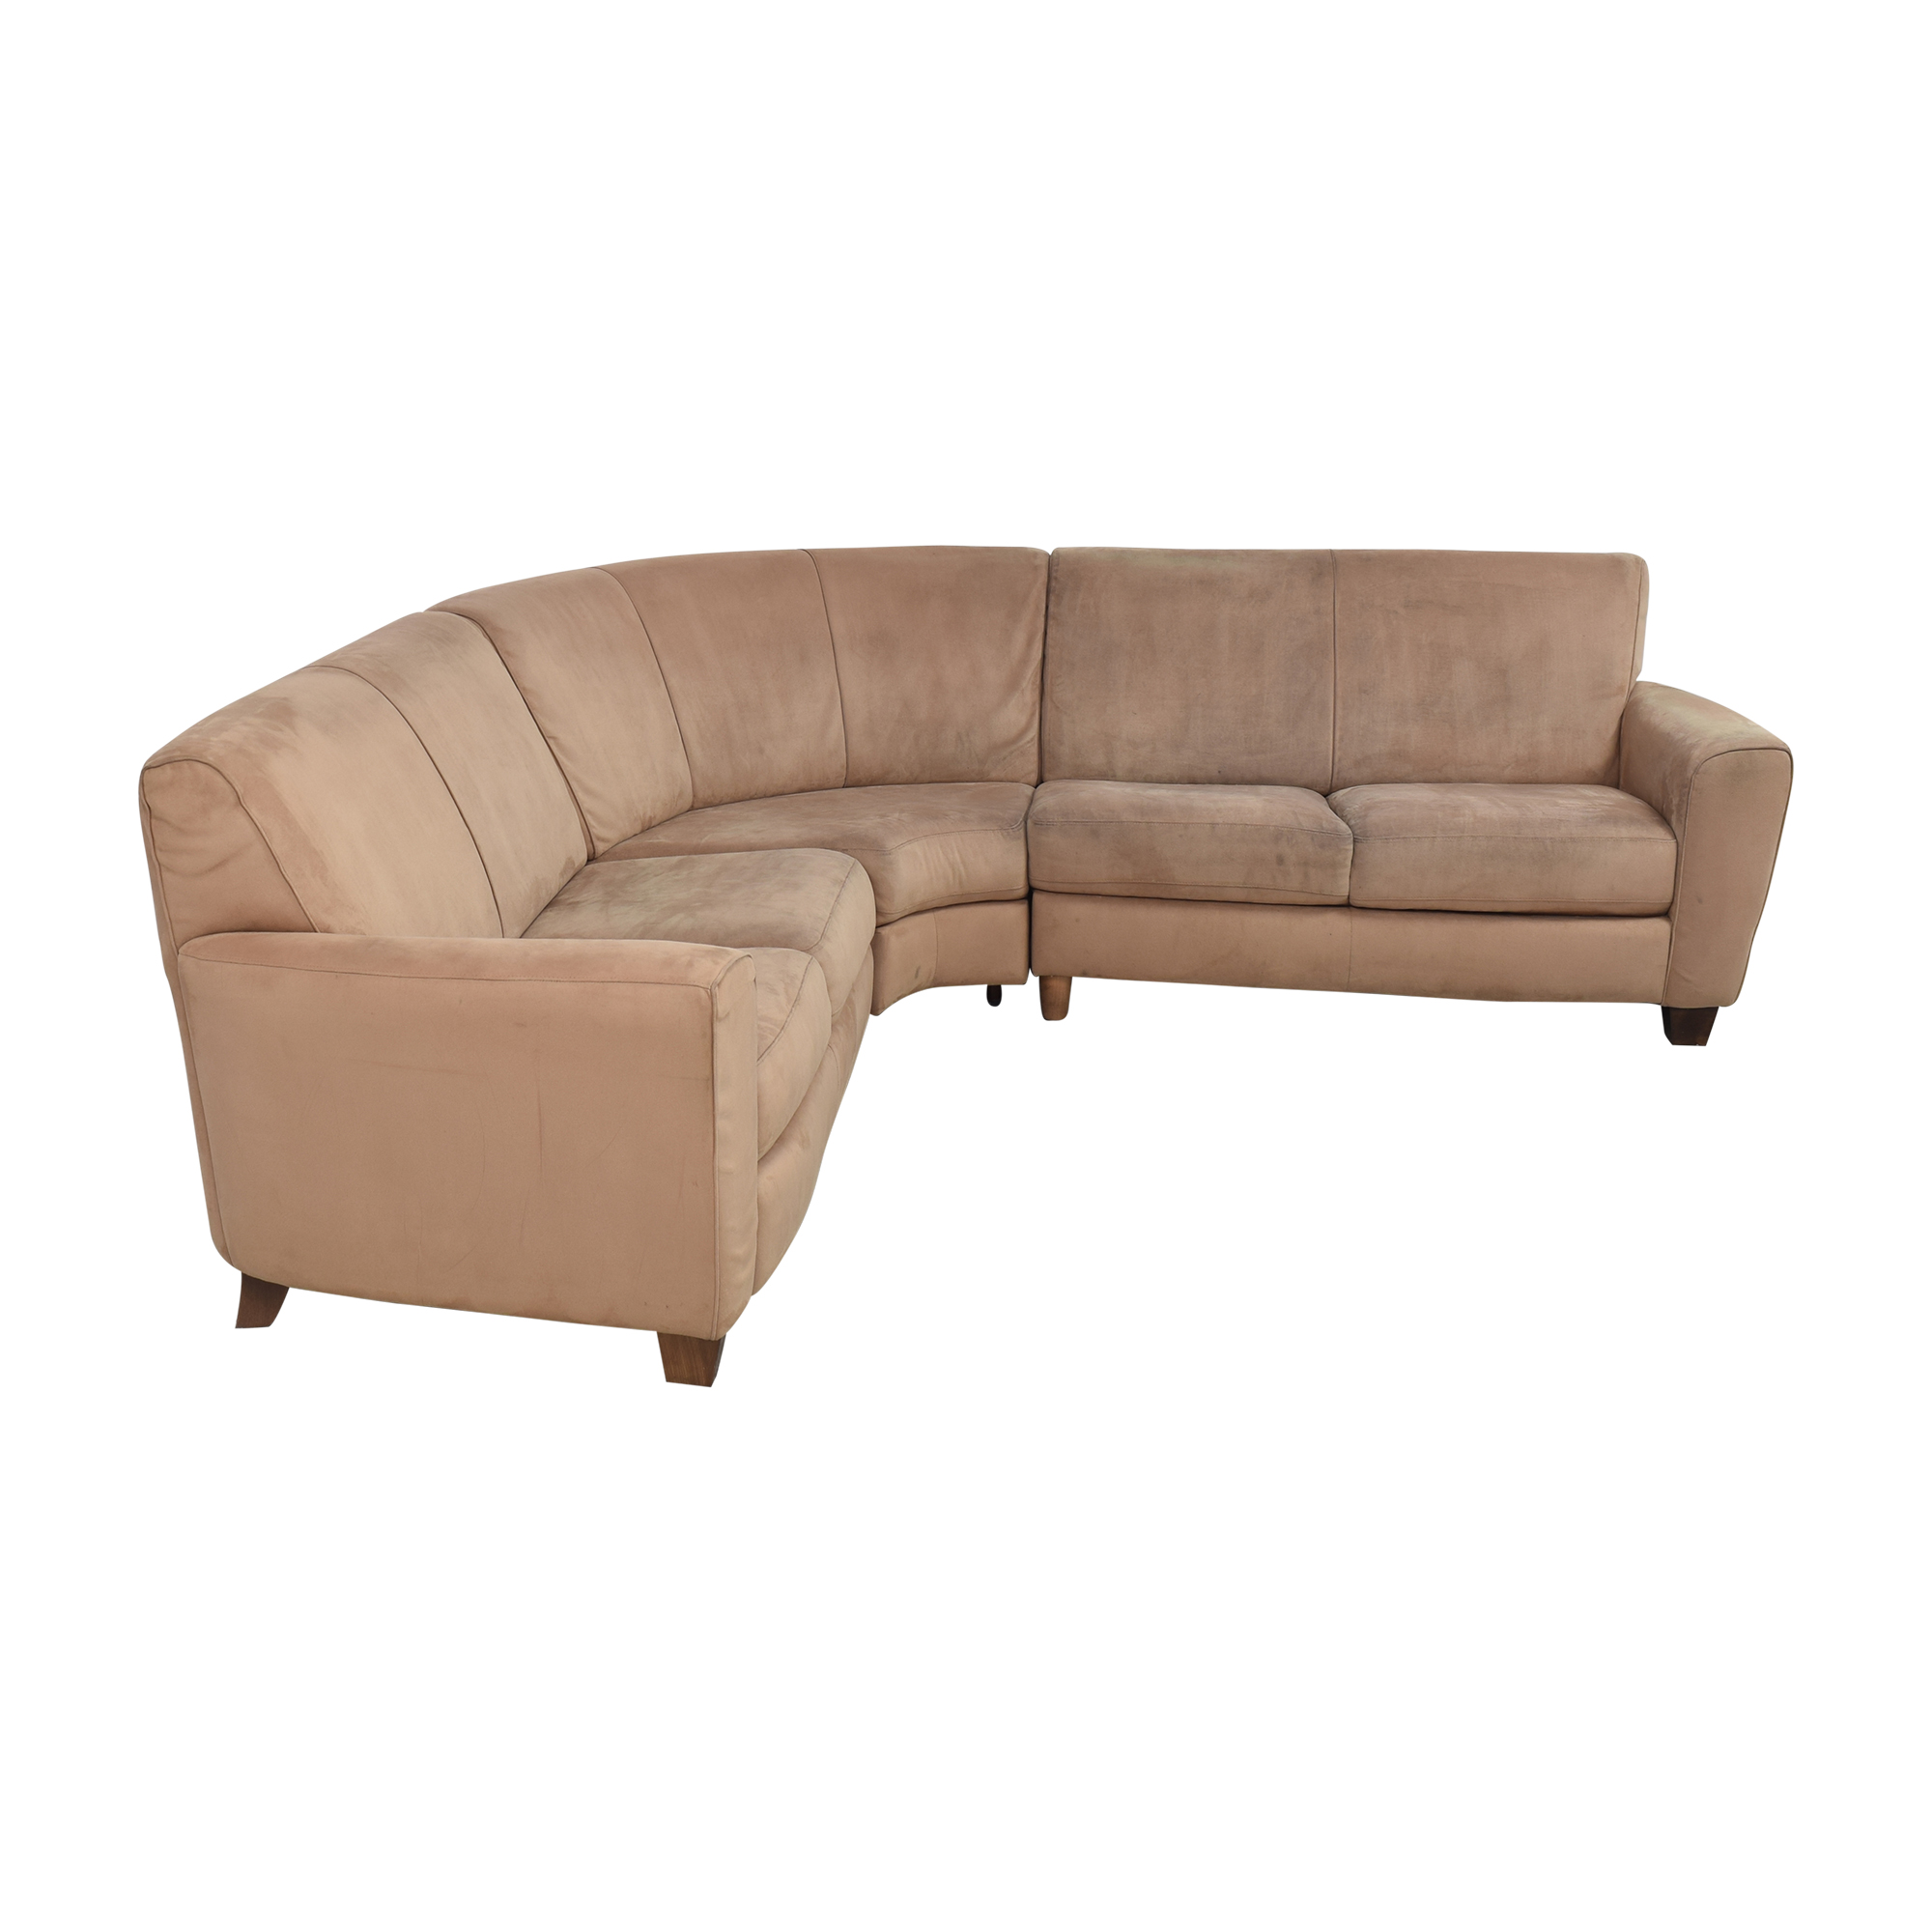 Natuzzi Natuzzi Corner Sectional Sofa discount